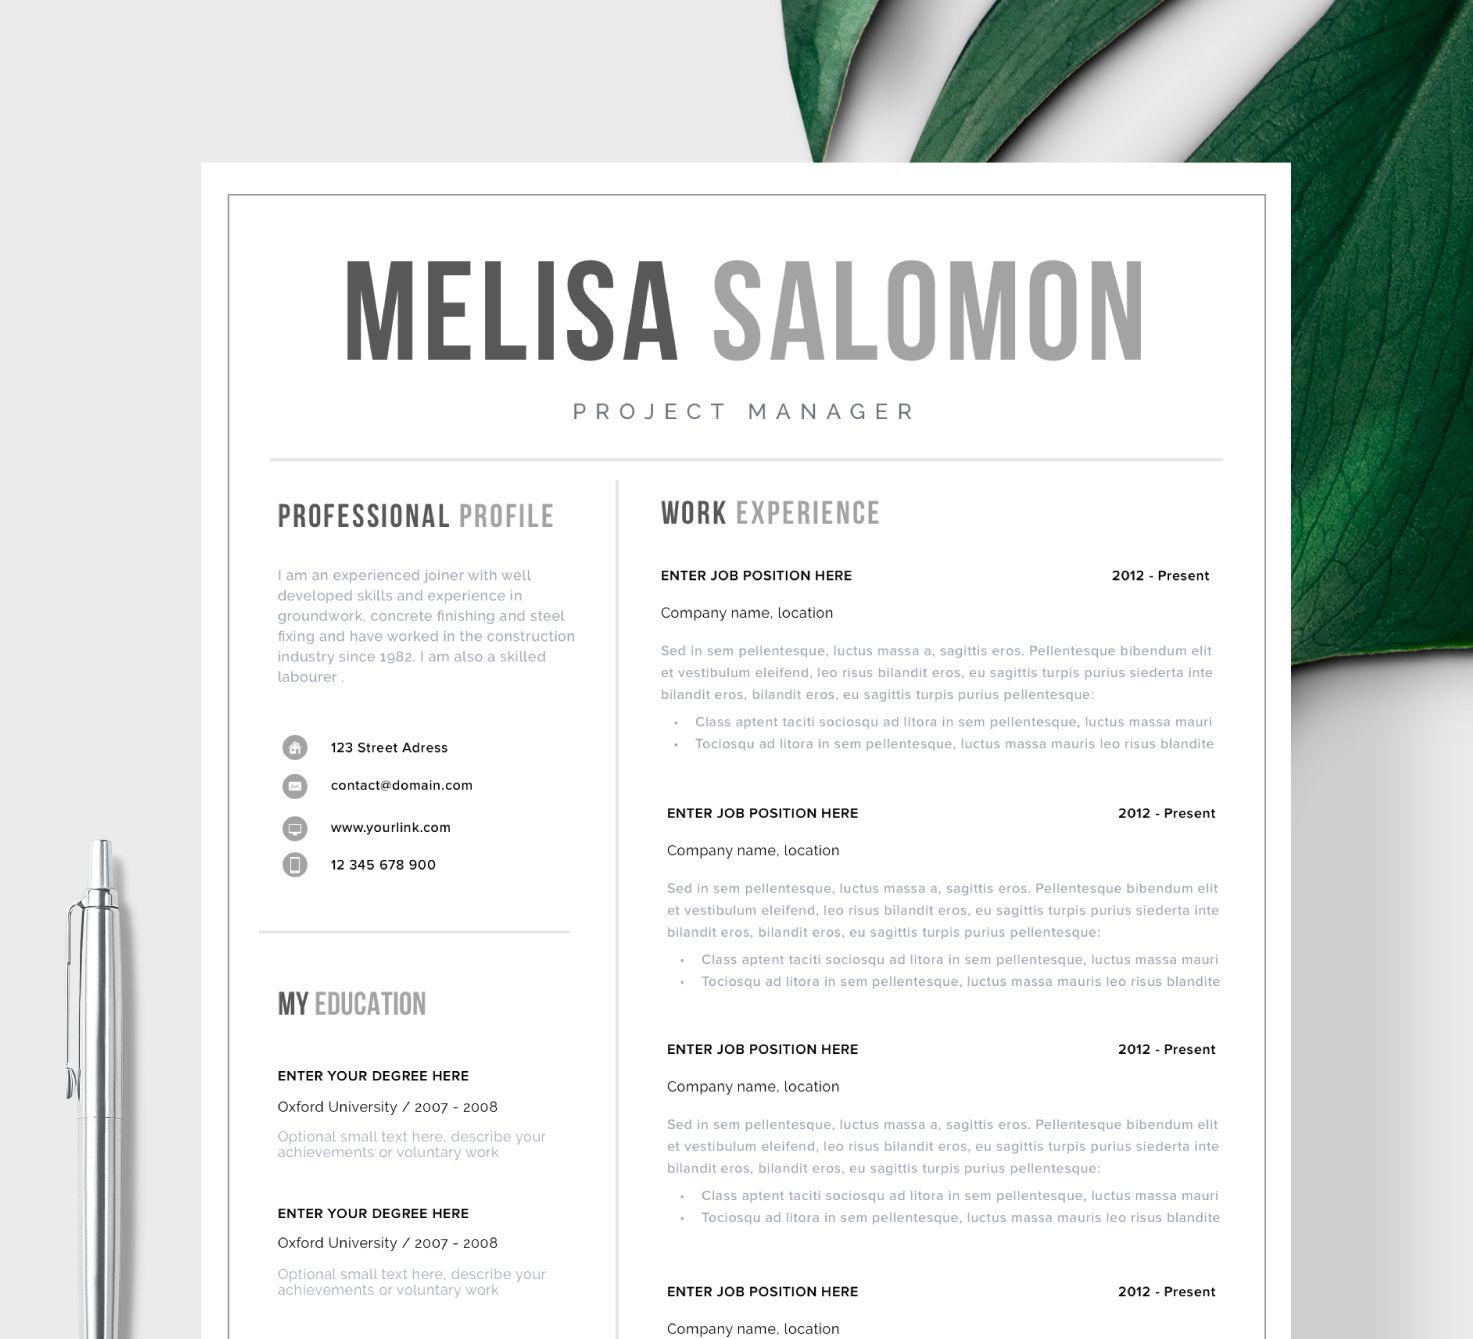 Szablon CV, projekt CV, Wzór CV w pełni edytowalny w